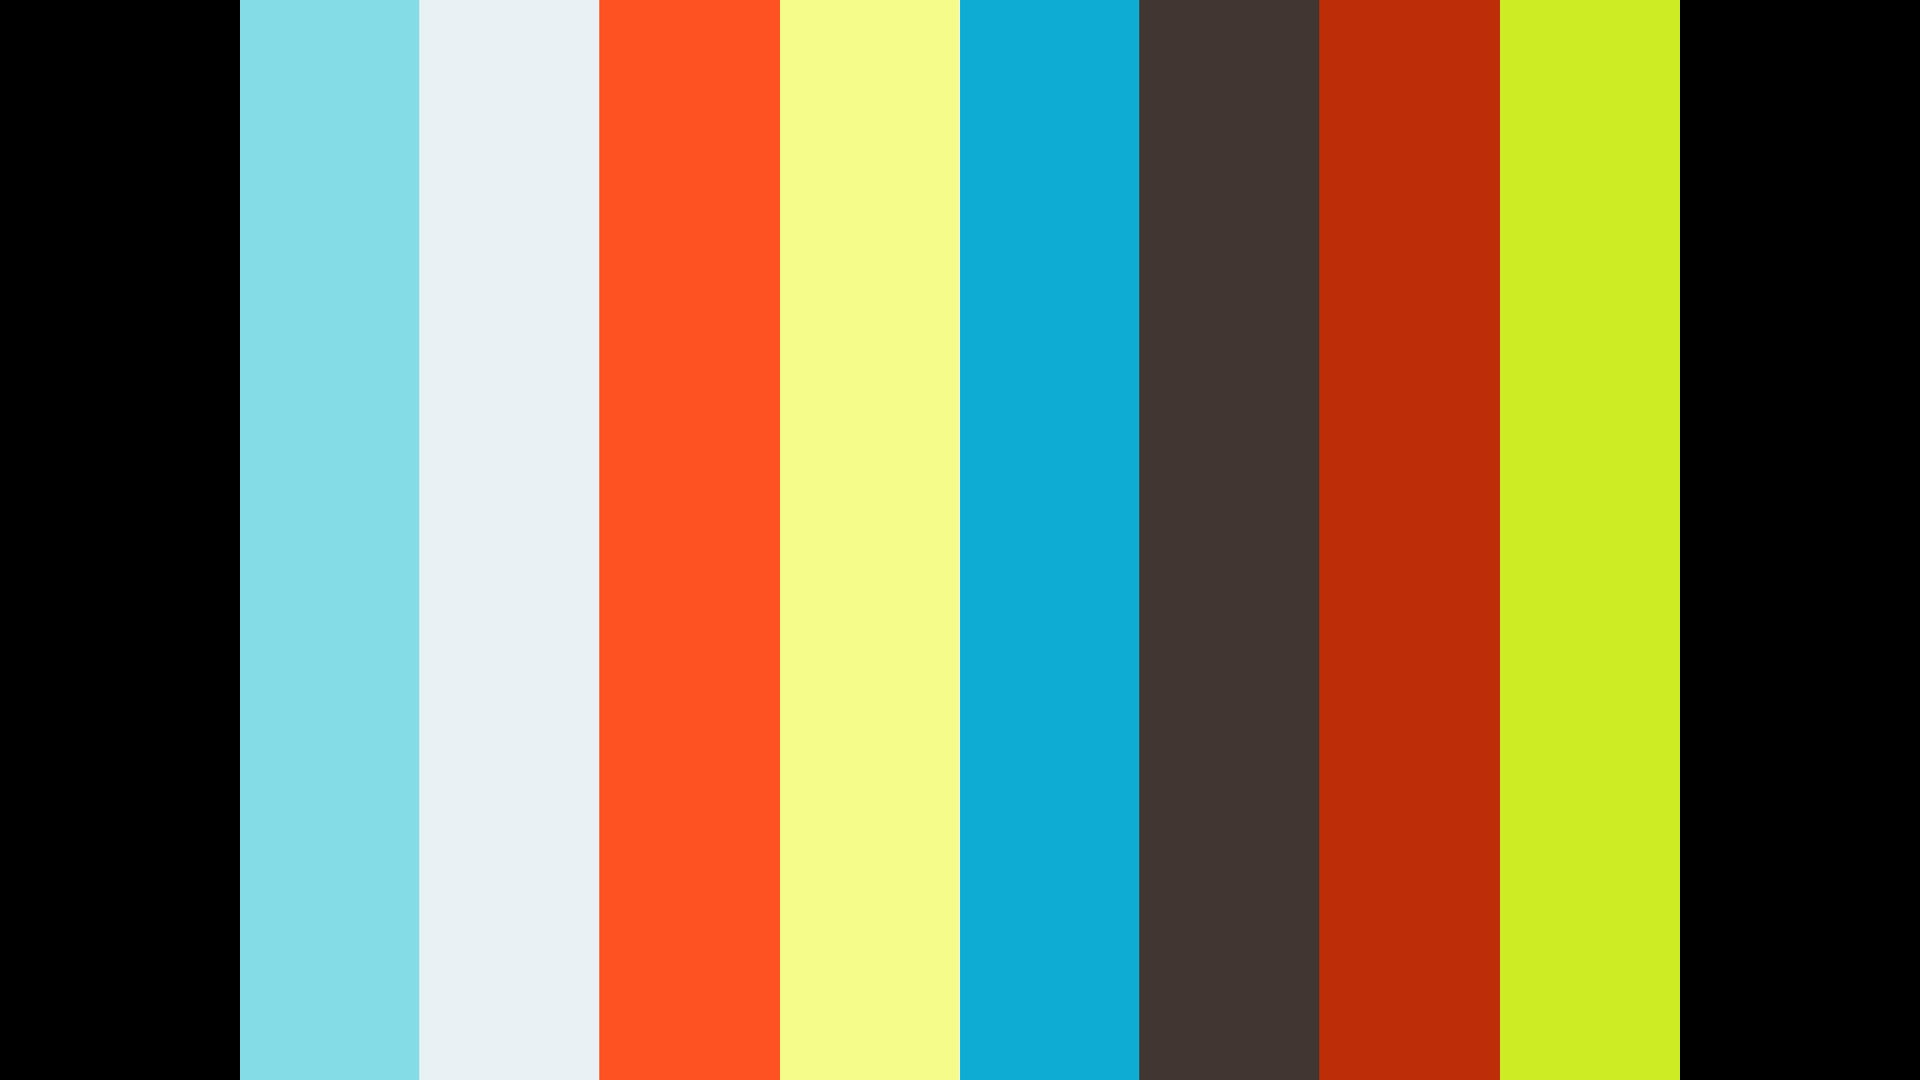 CHERYL - ABSOLUTE 45 (13 September 2021)